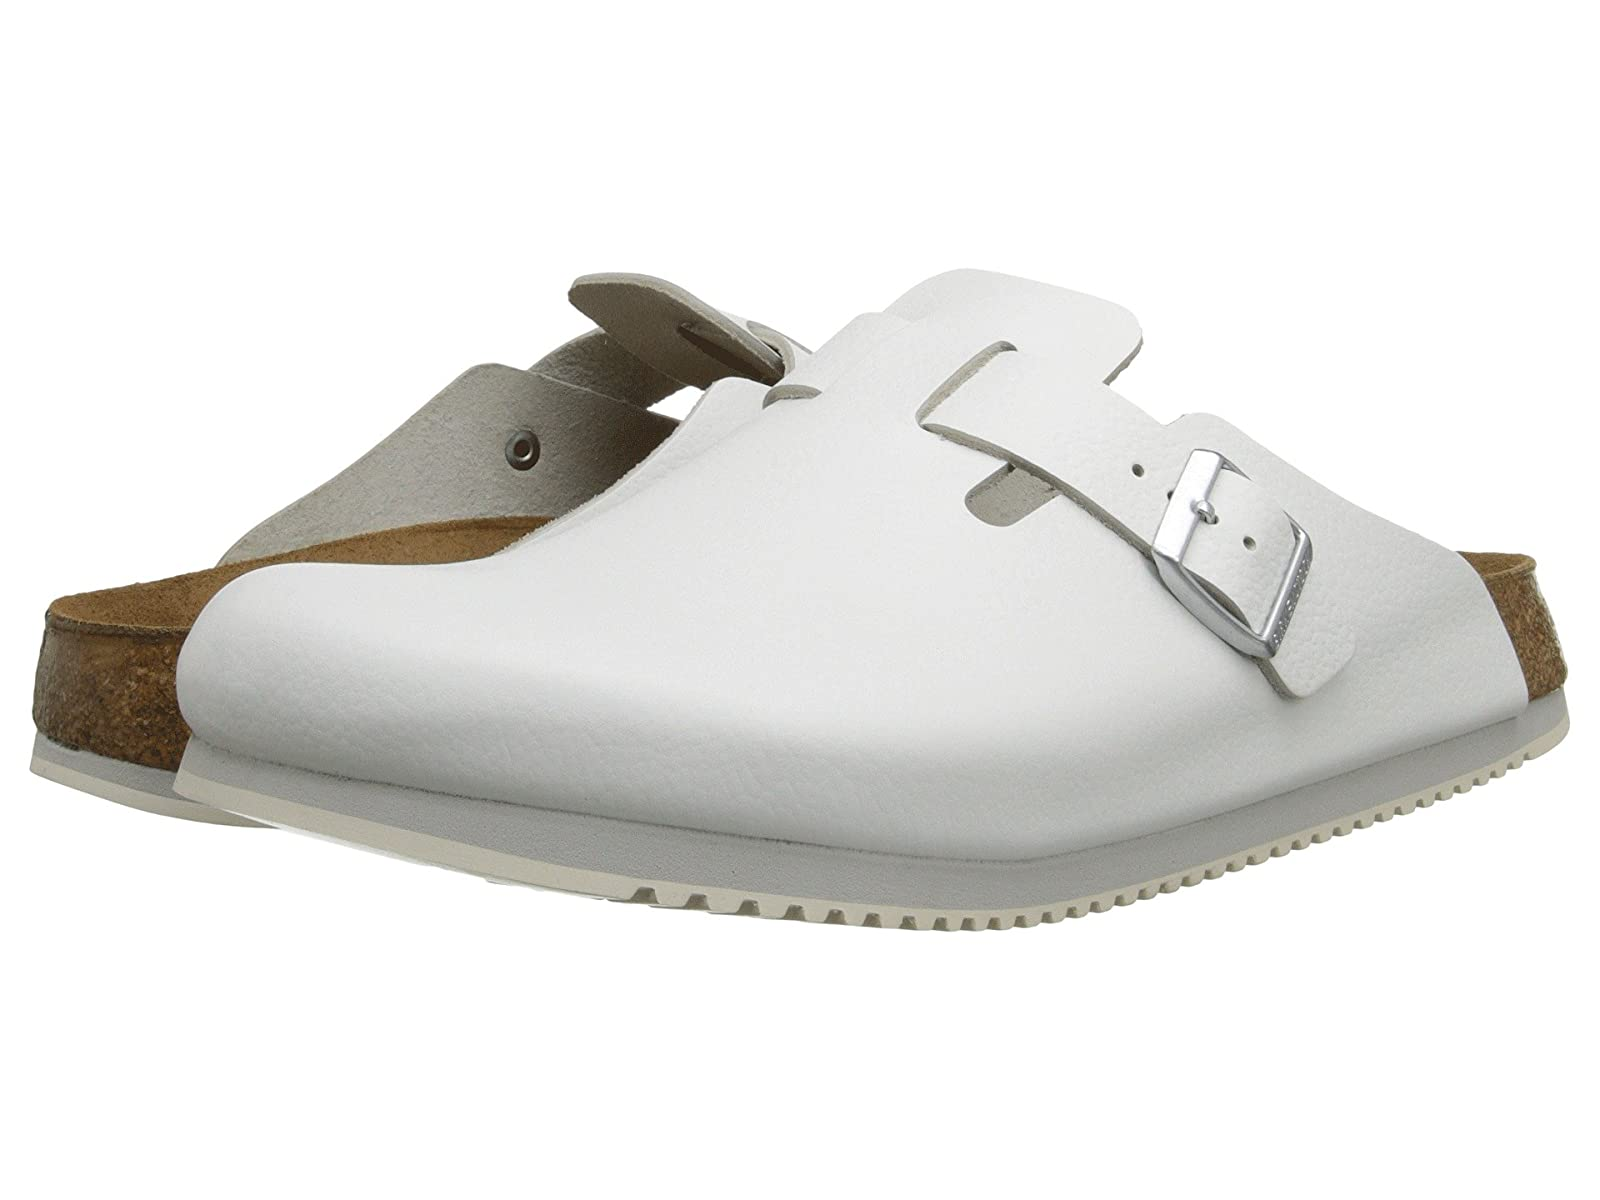 Birkenstock Boston Super GripEconomical and quality shoes